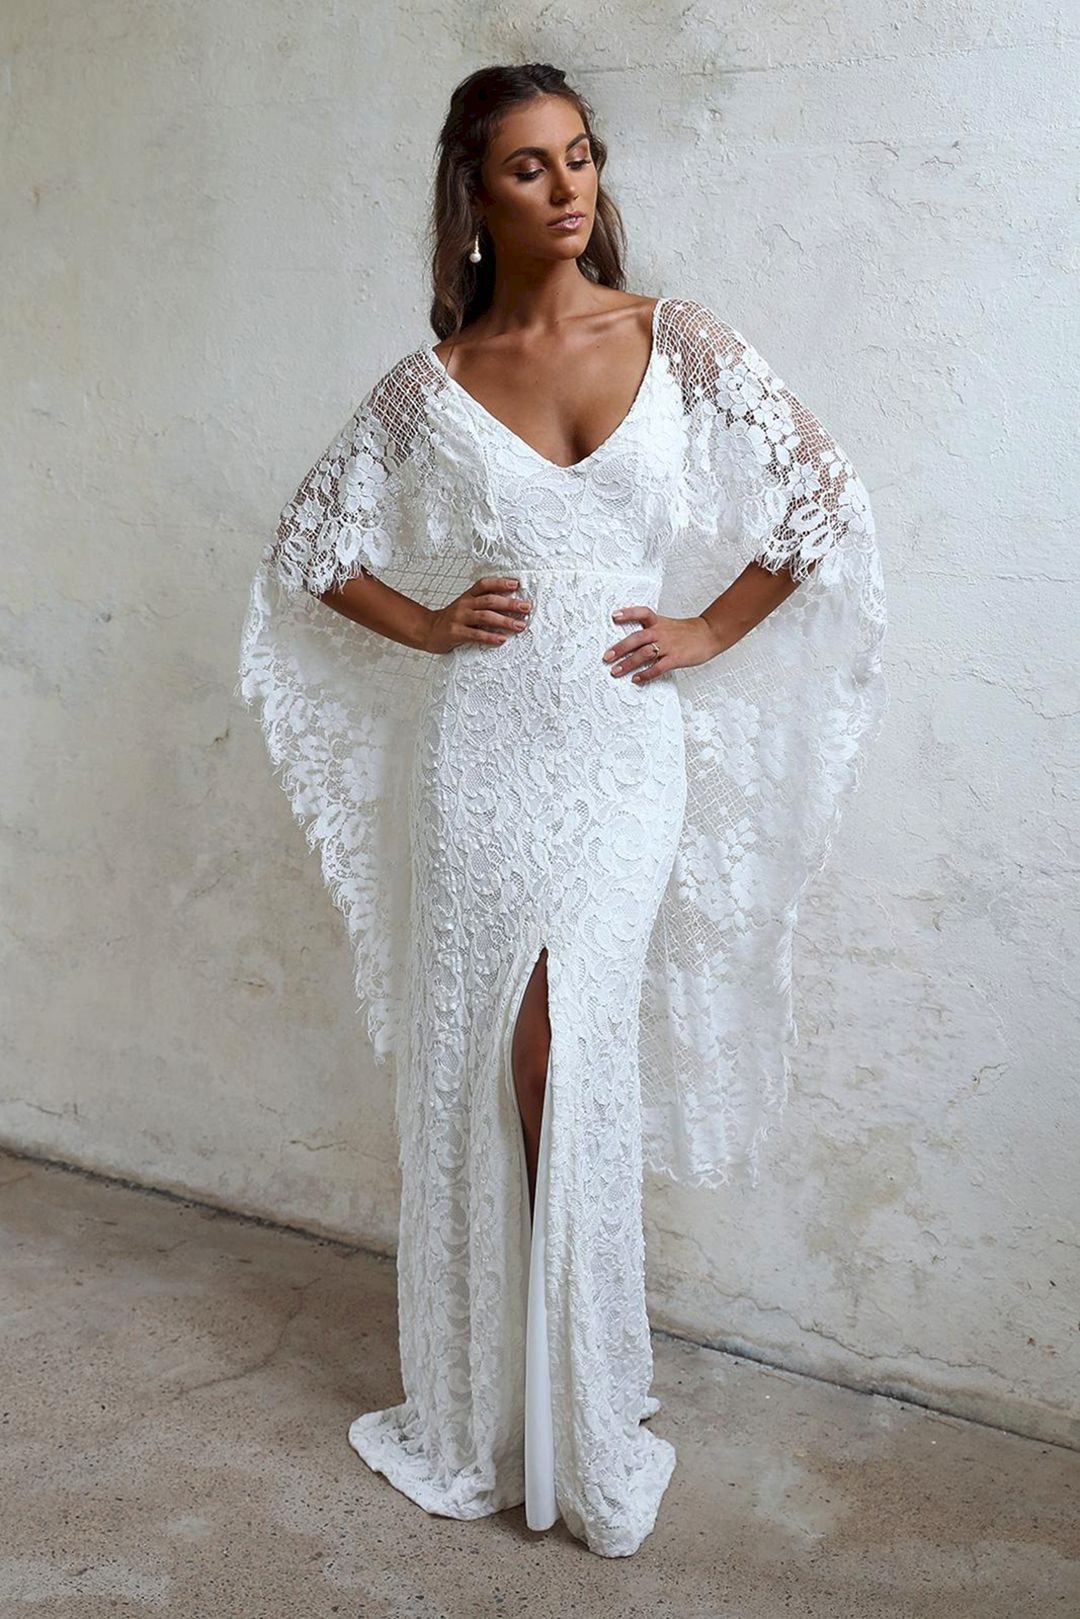 Top beautiful grace loves lace wedding dresses top lace